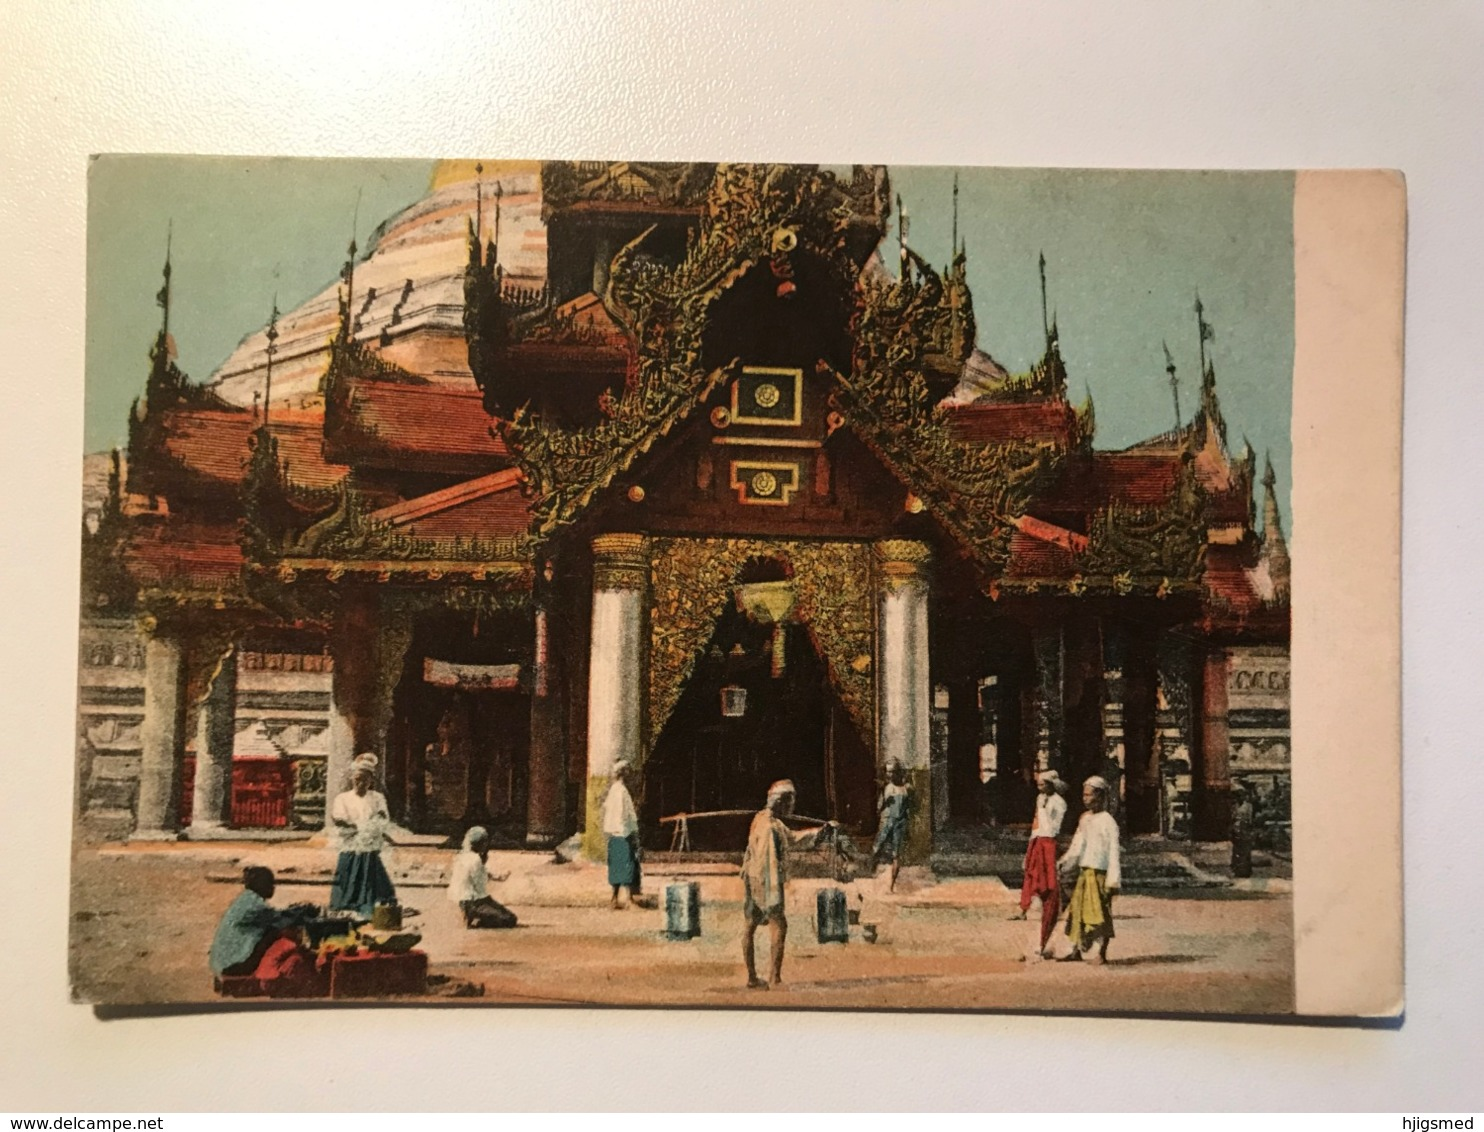 Asia Myanmar Mianmar Burma Birmania Church Temple Water Carrier 11724 Post Card Postkarte POSTCARD - Myanmar (Birma)